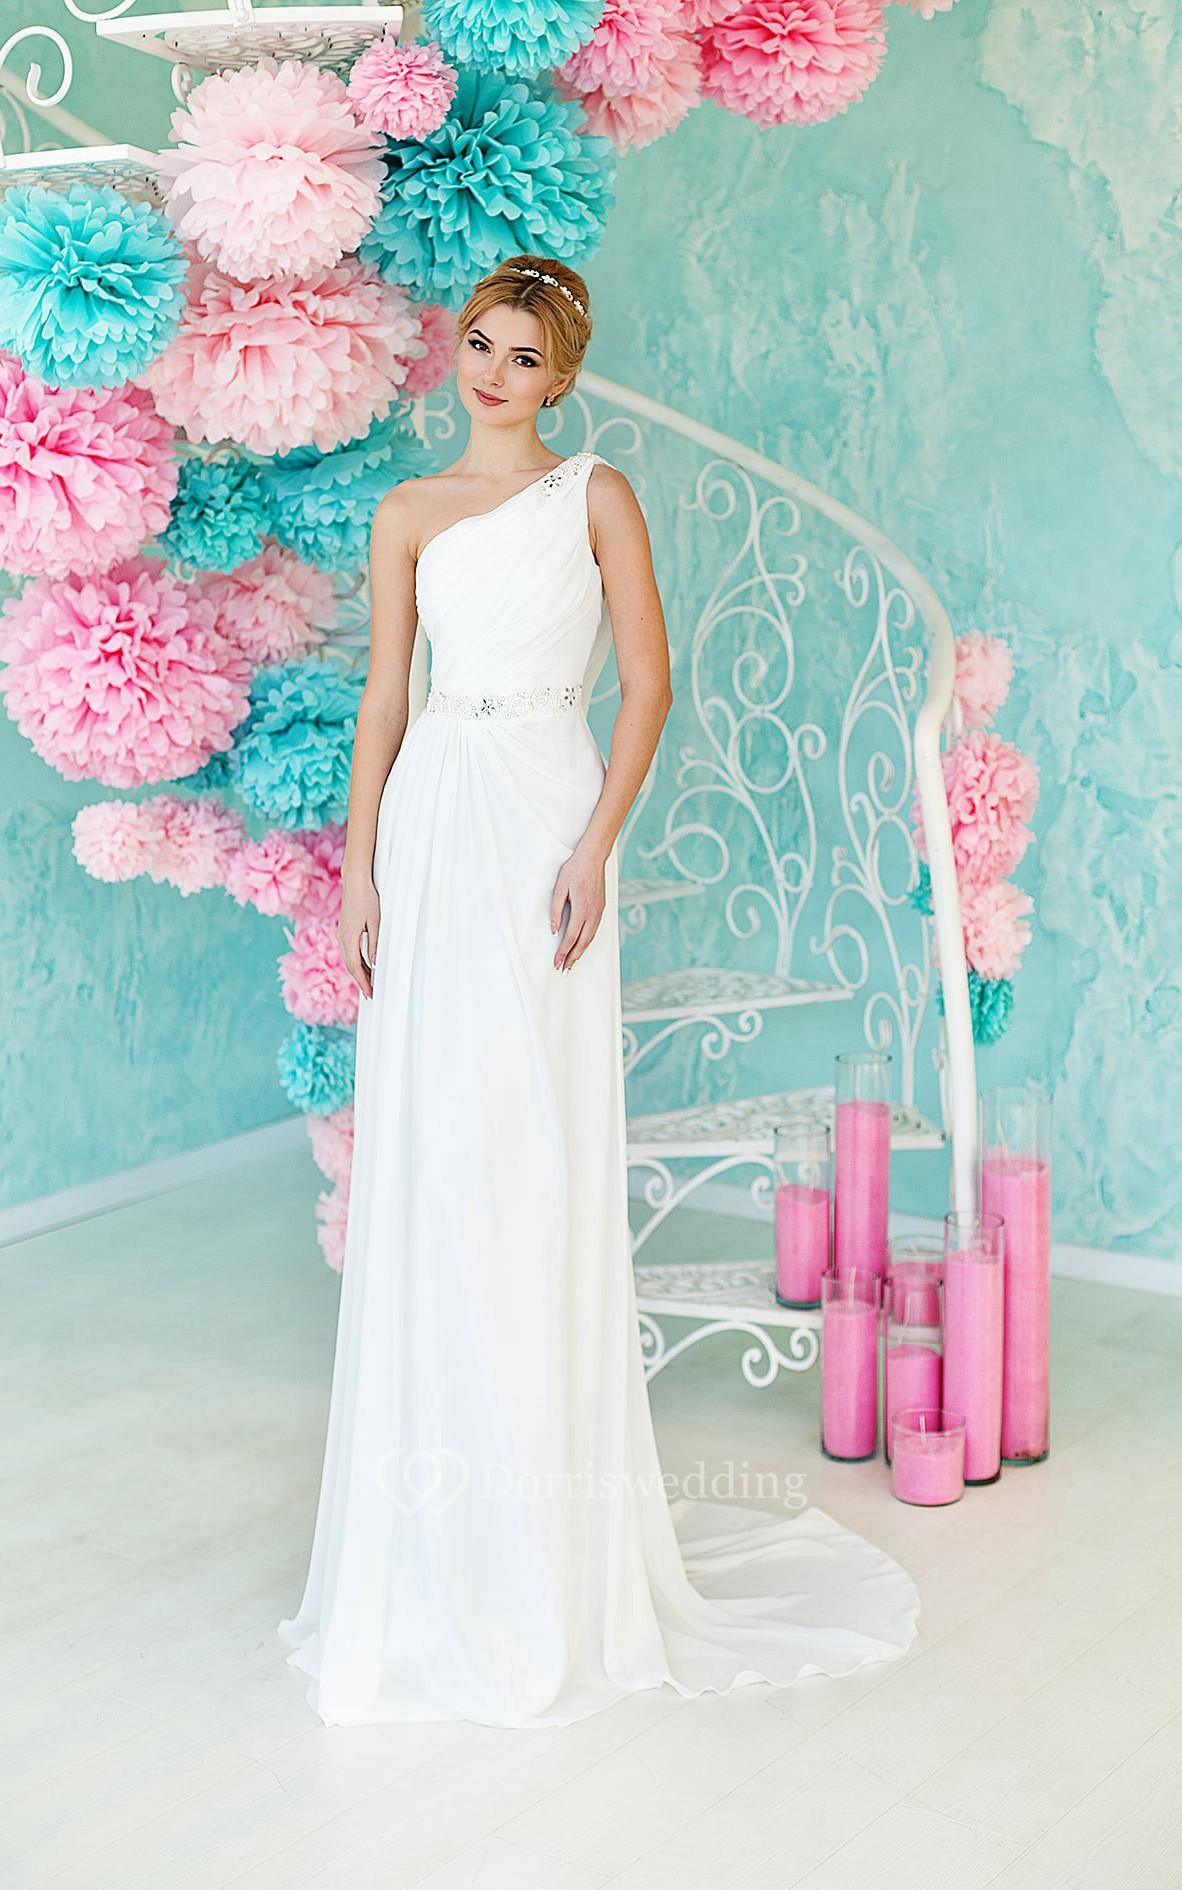 Sheath Floor-Length One-Shoulder Sleeveless Lace-Up Chiffon Dress With Ruching And Beading